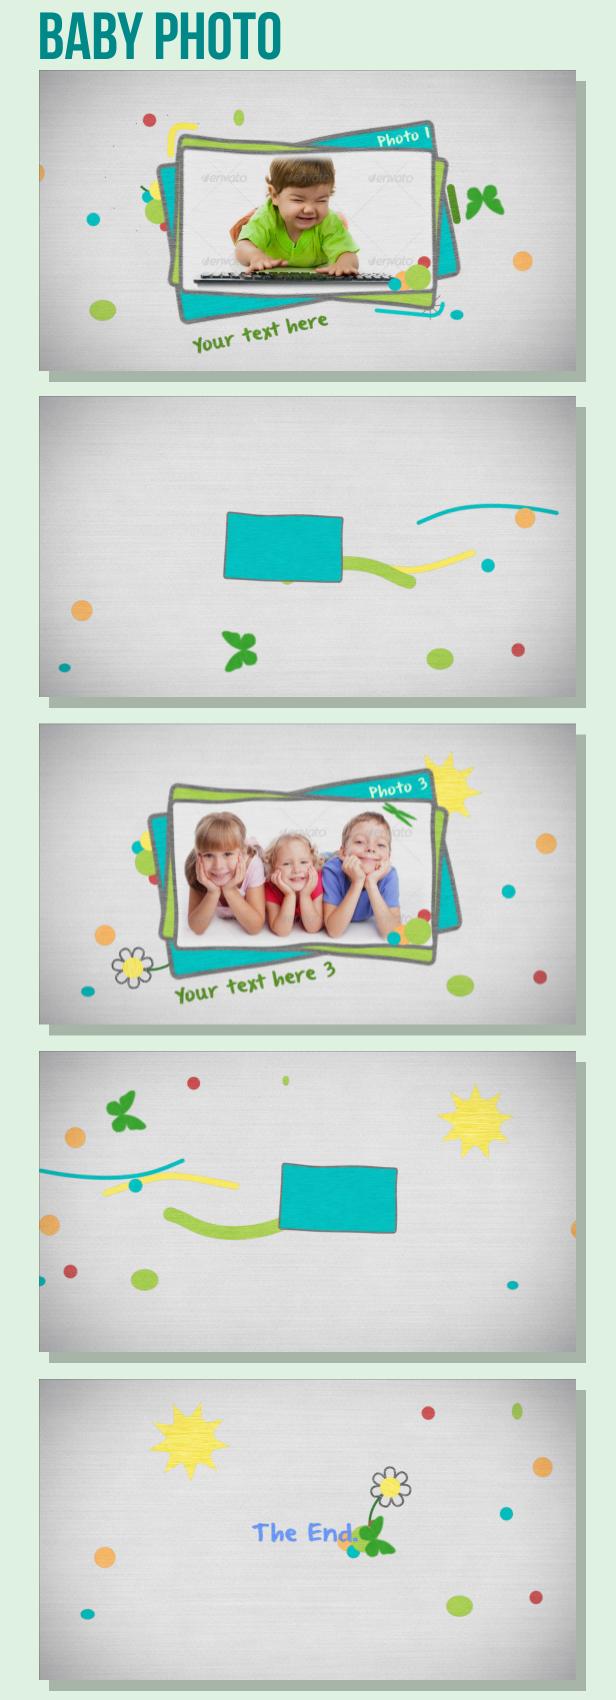 baby_photo_big